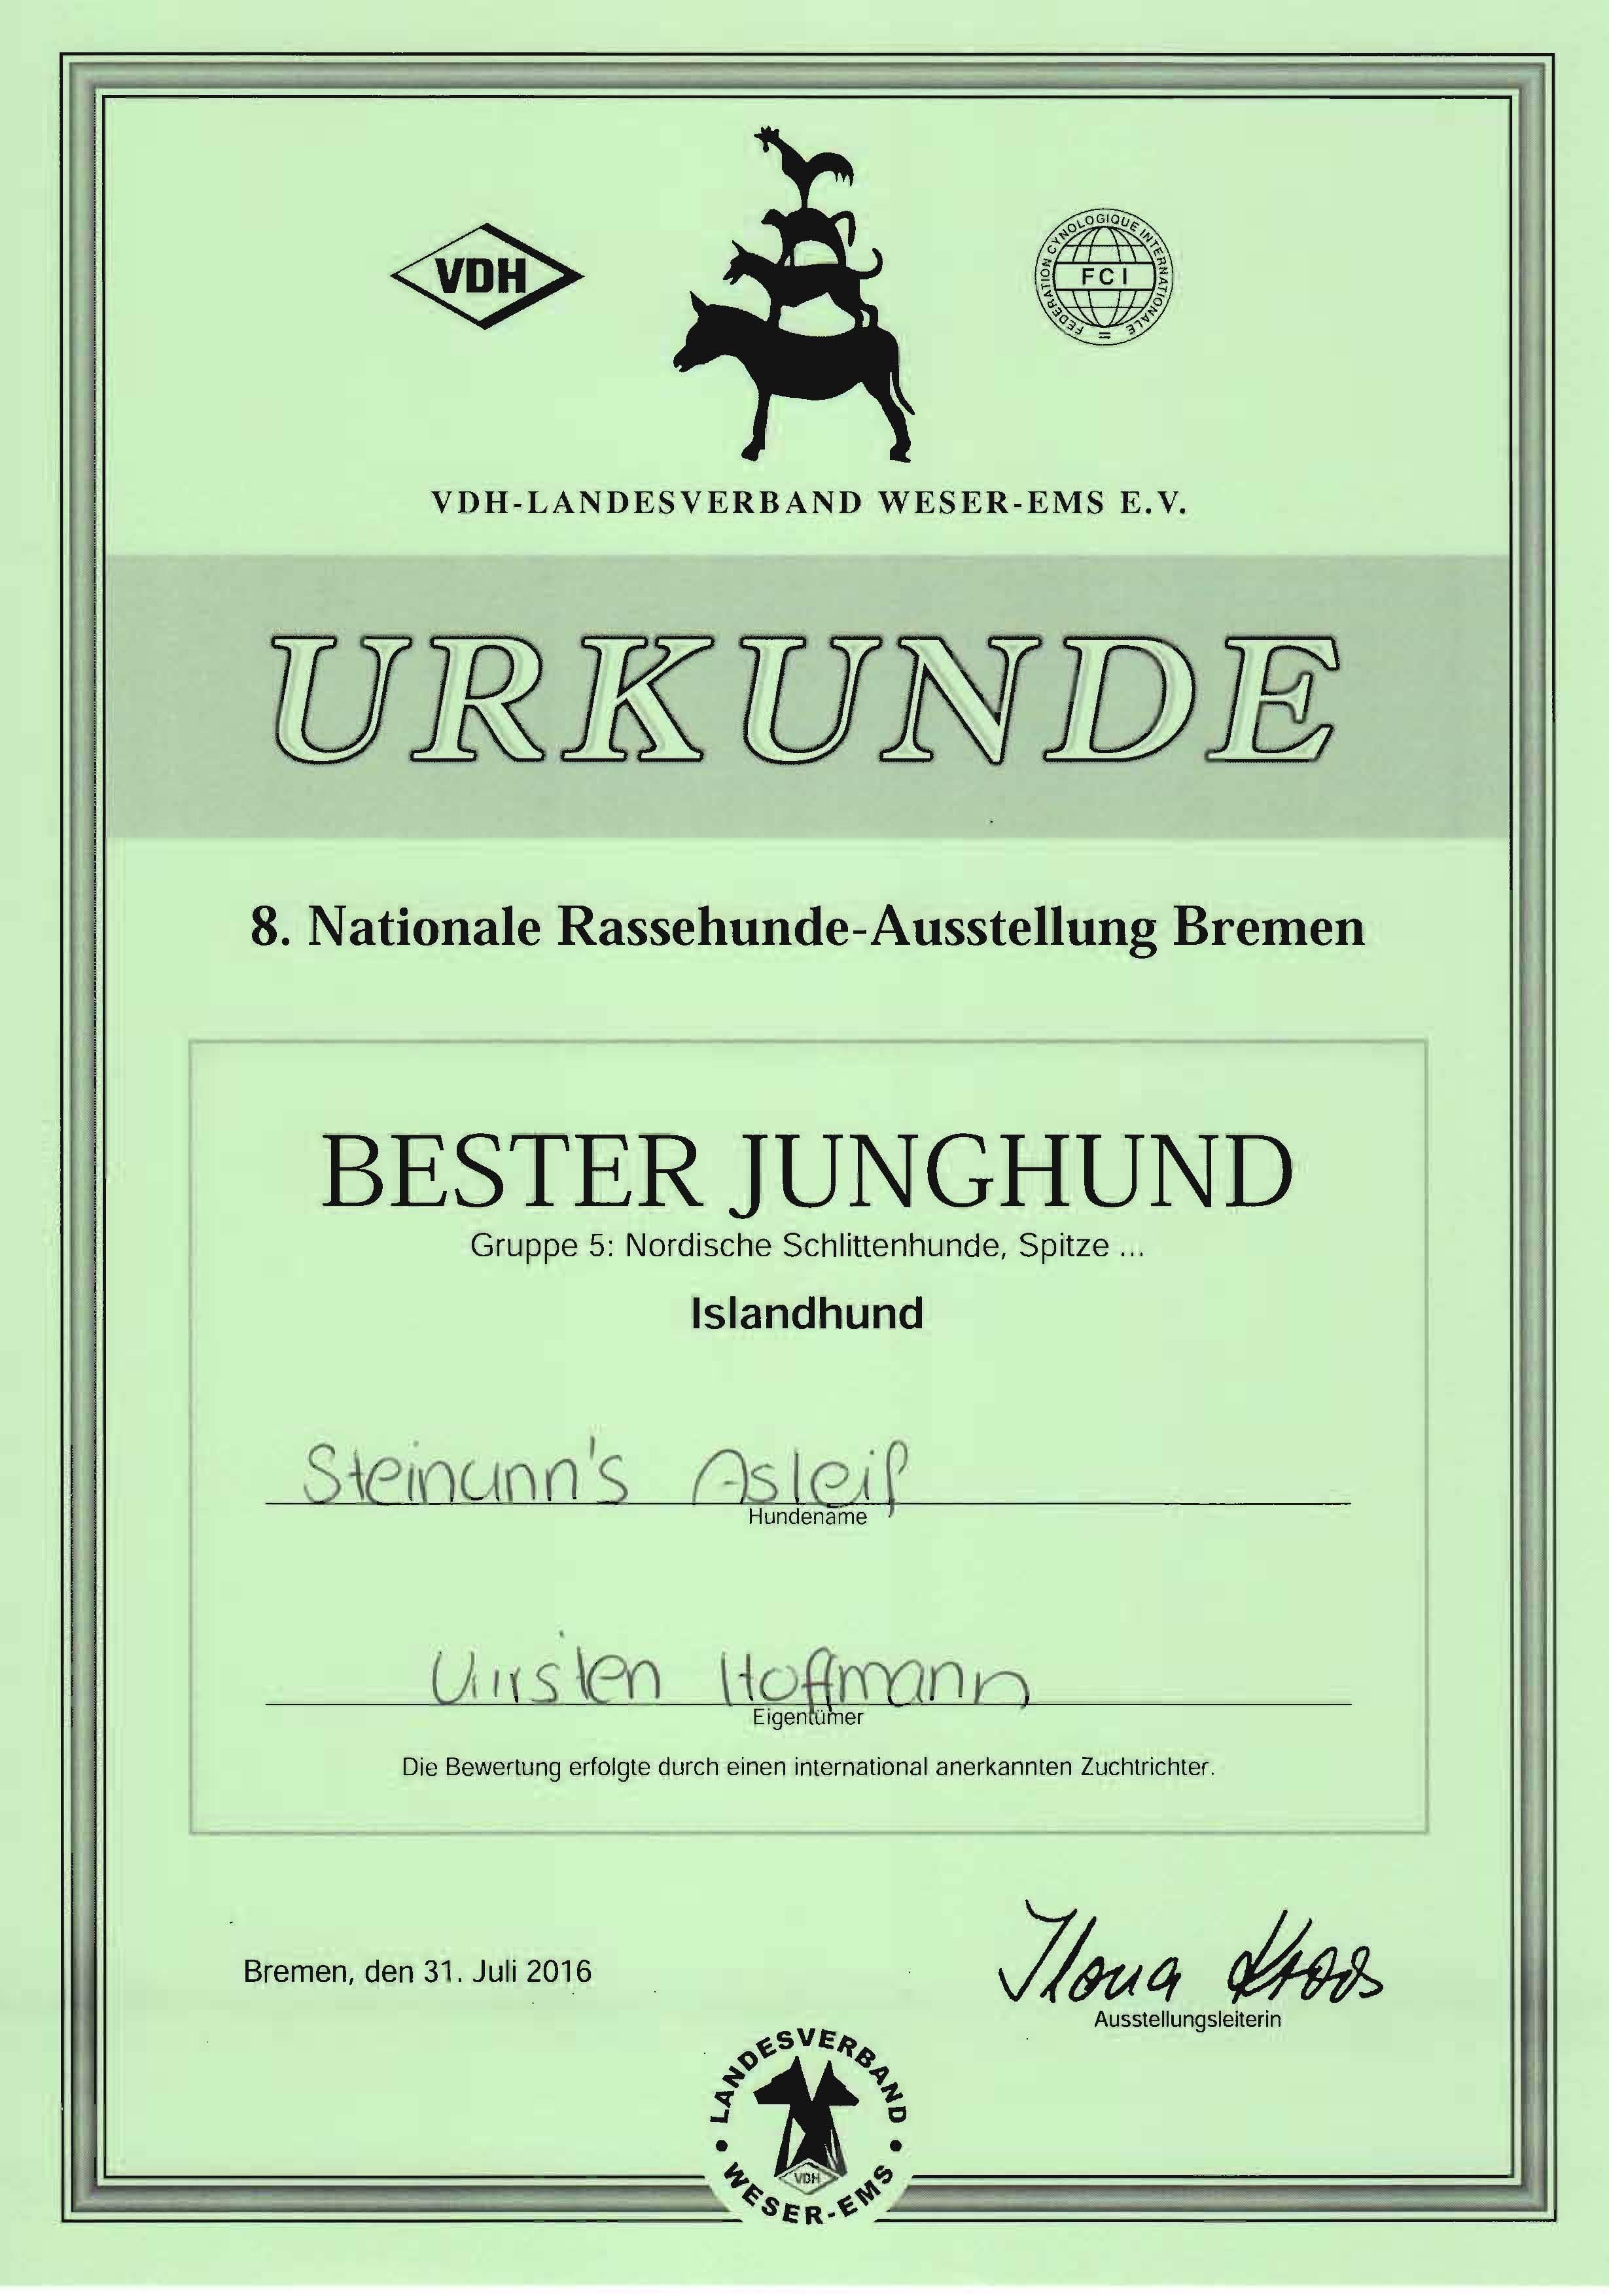 Nationale-Bremen-Juli-2016-Asleif-Bester-Junghund